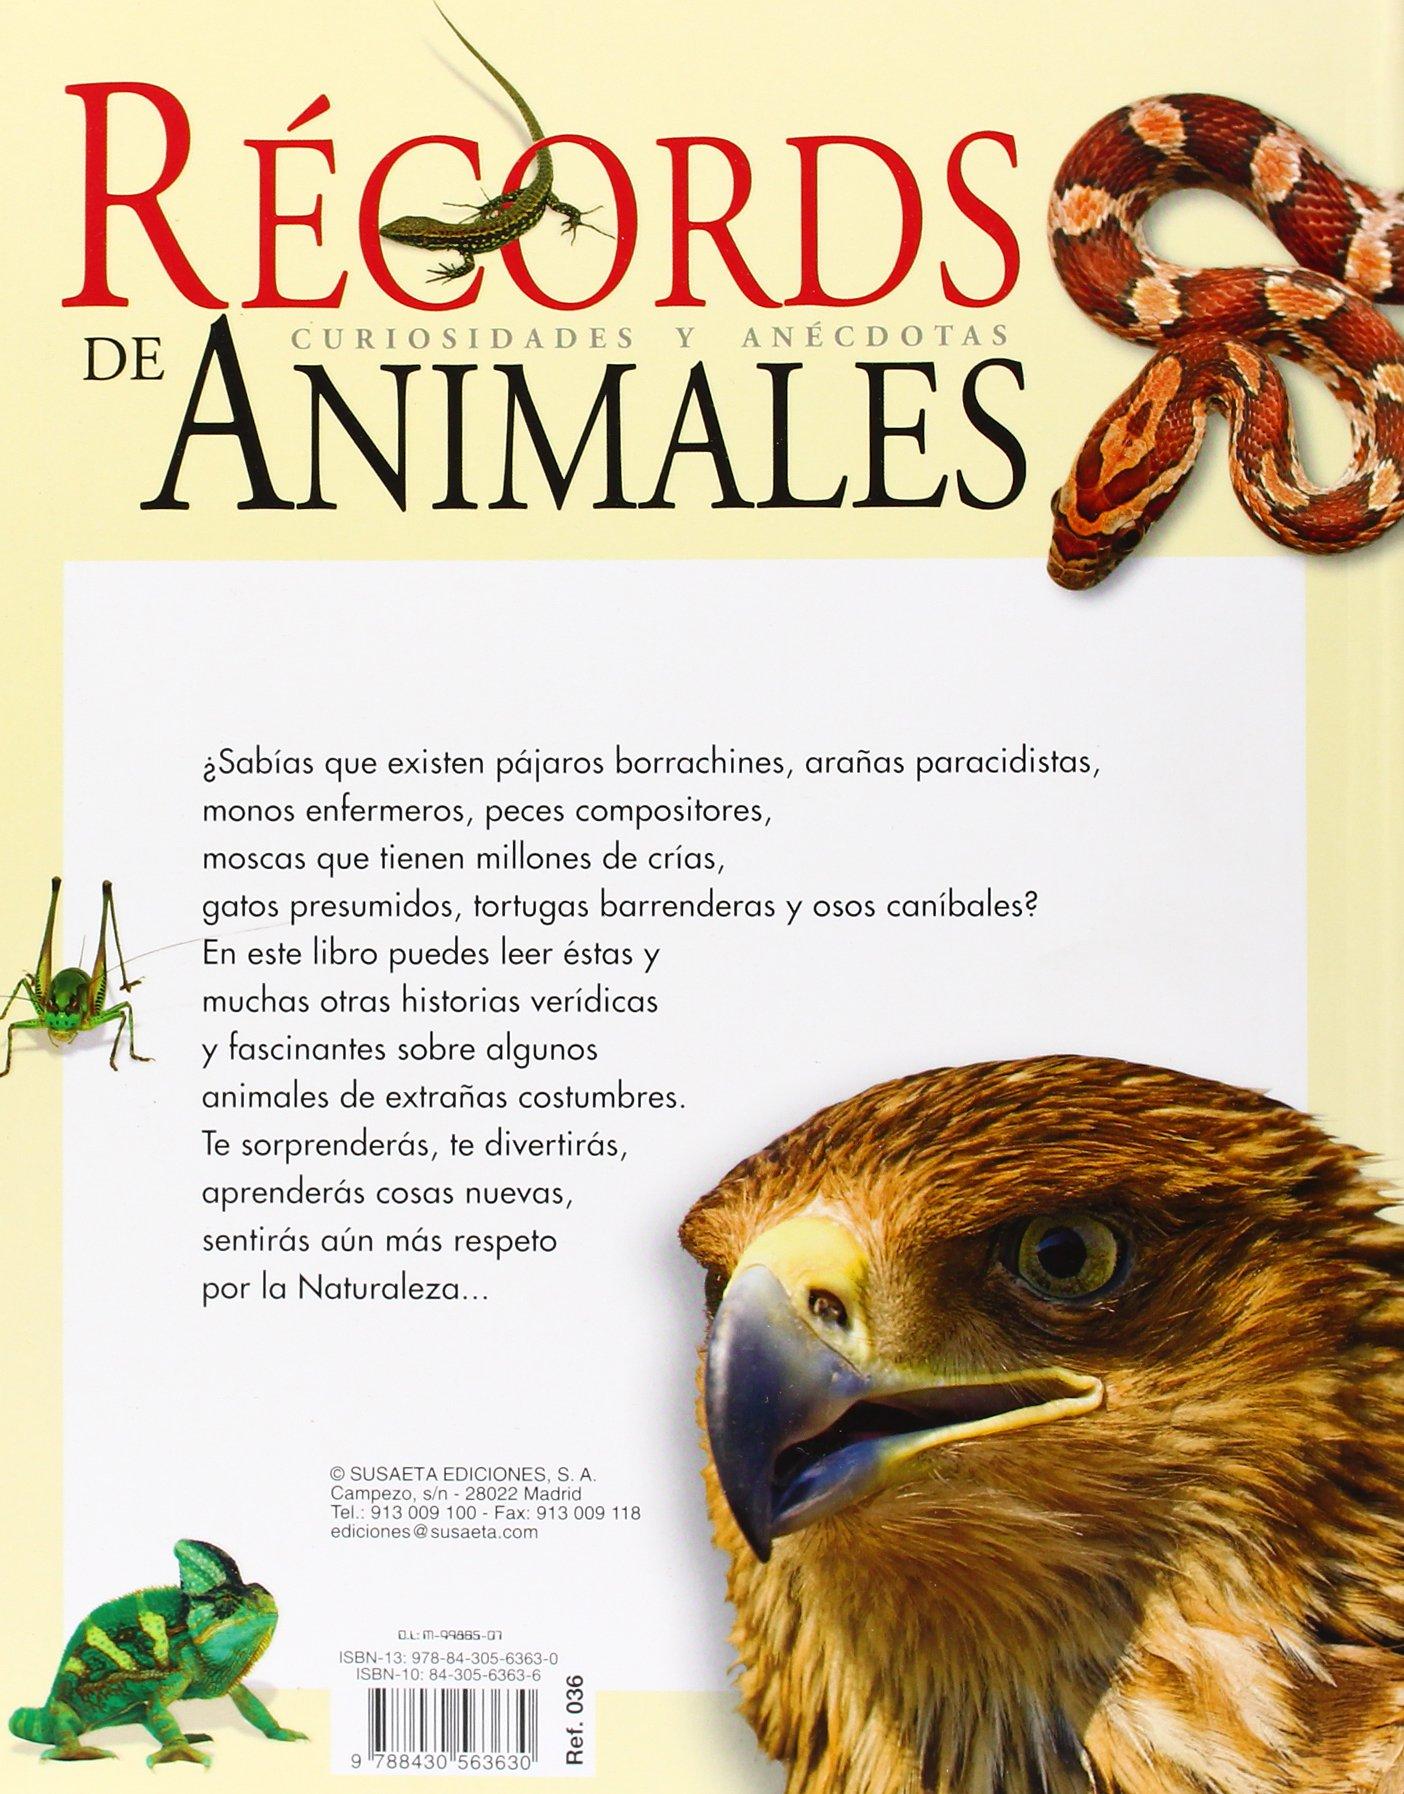 Amazon.com: Récords de animales: Curiosidades y anécdotas (Spanish Edition) (9788430563630): Inc. Susaeta Publishing: Books